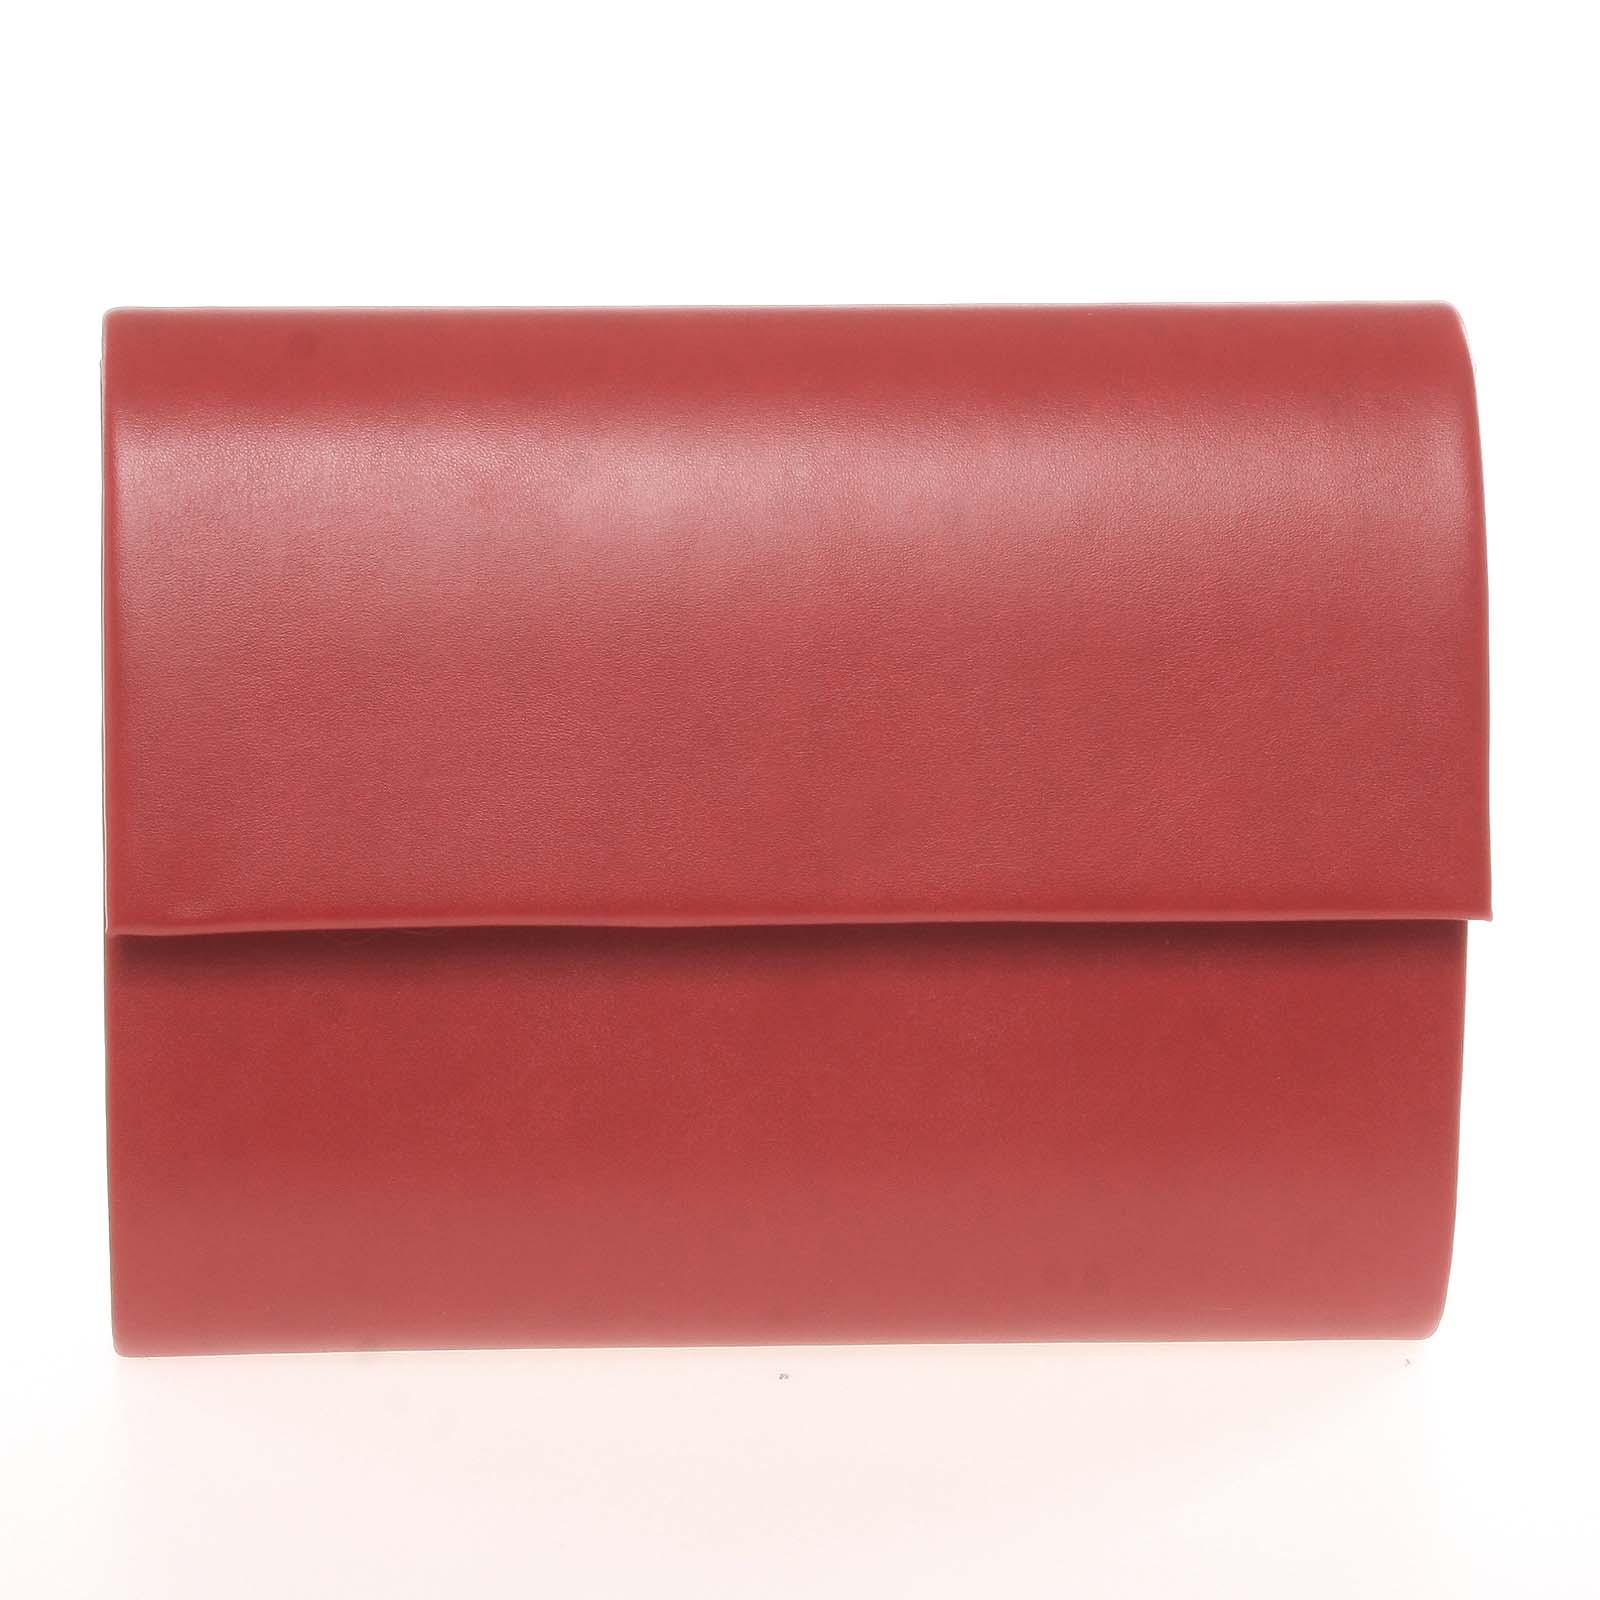 Stredná dámska elegantná listová kabelka červená matná - Delami Sandiego